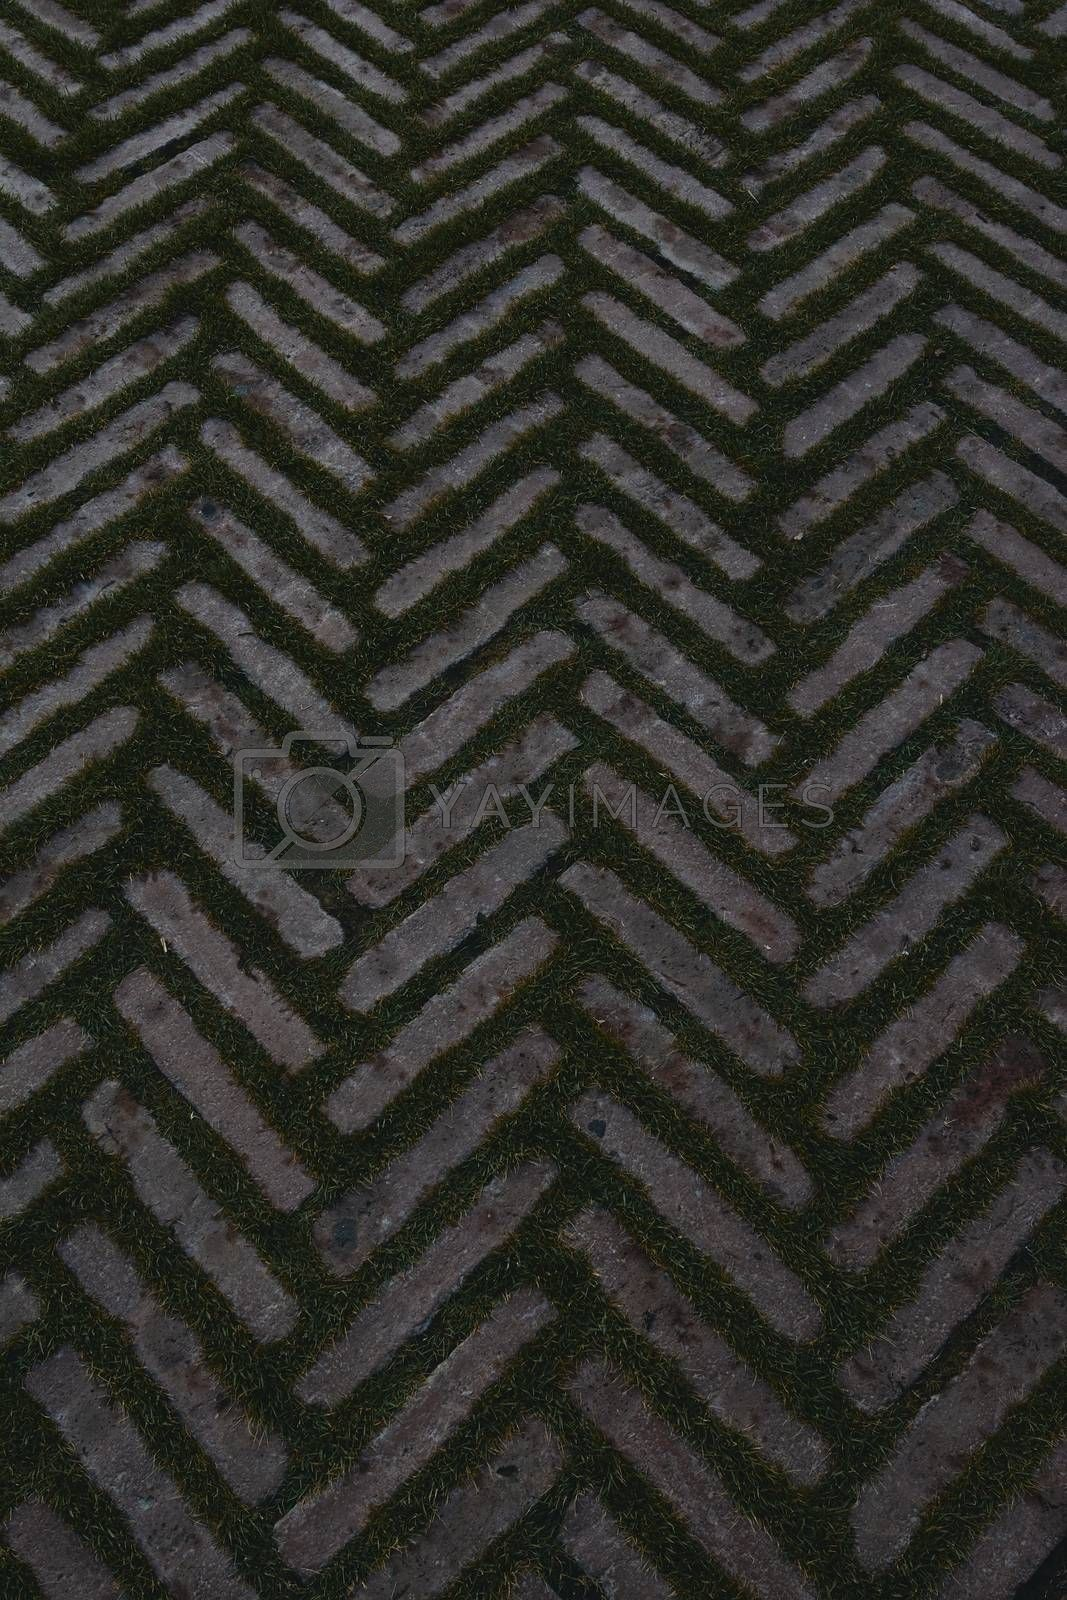 Stone brick and grass pattern background